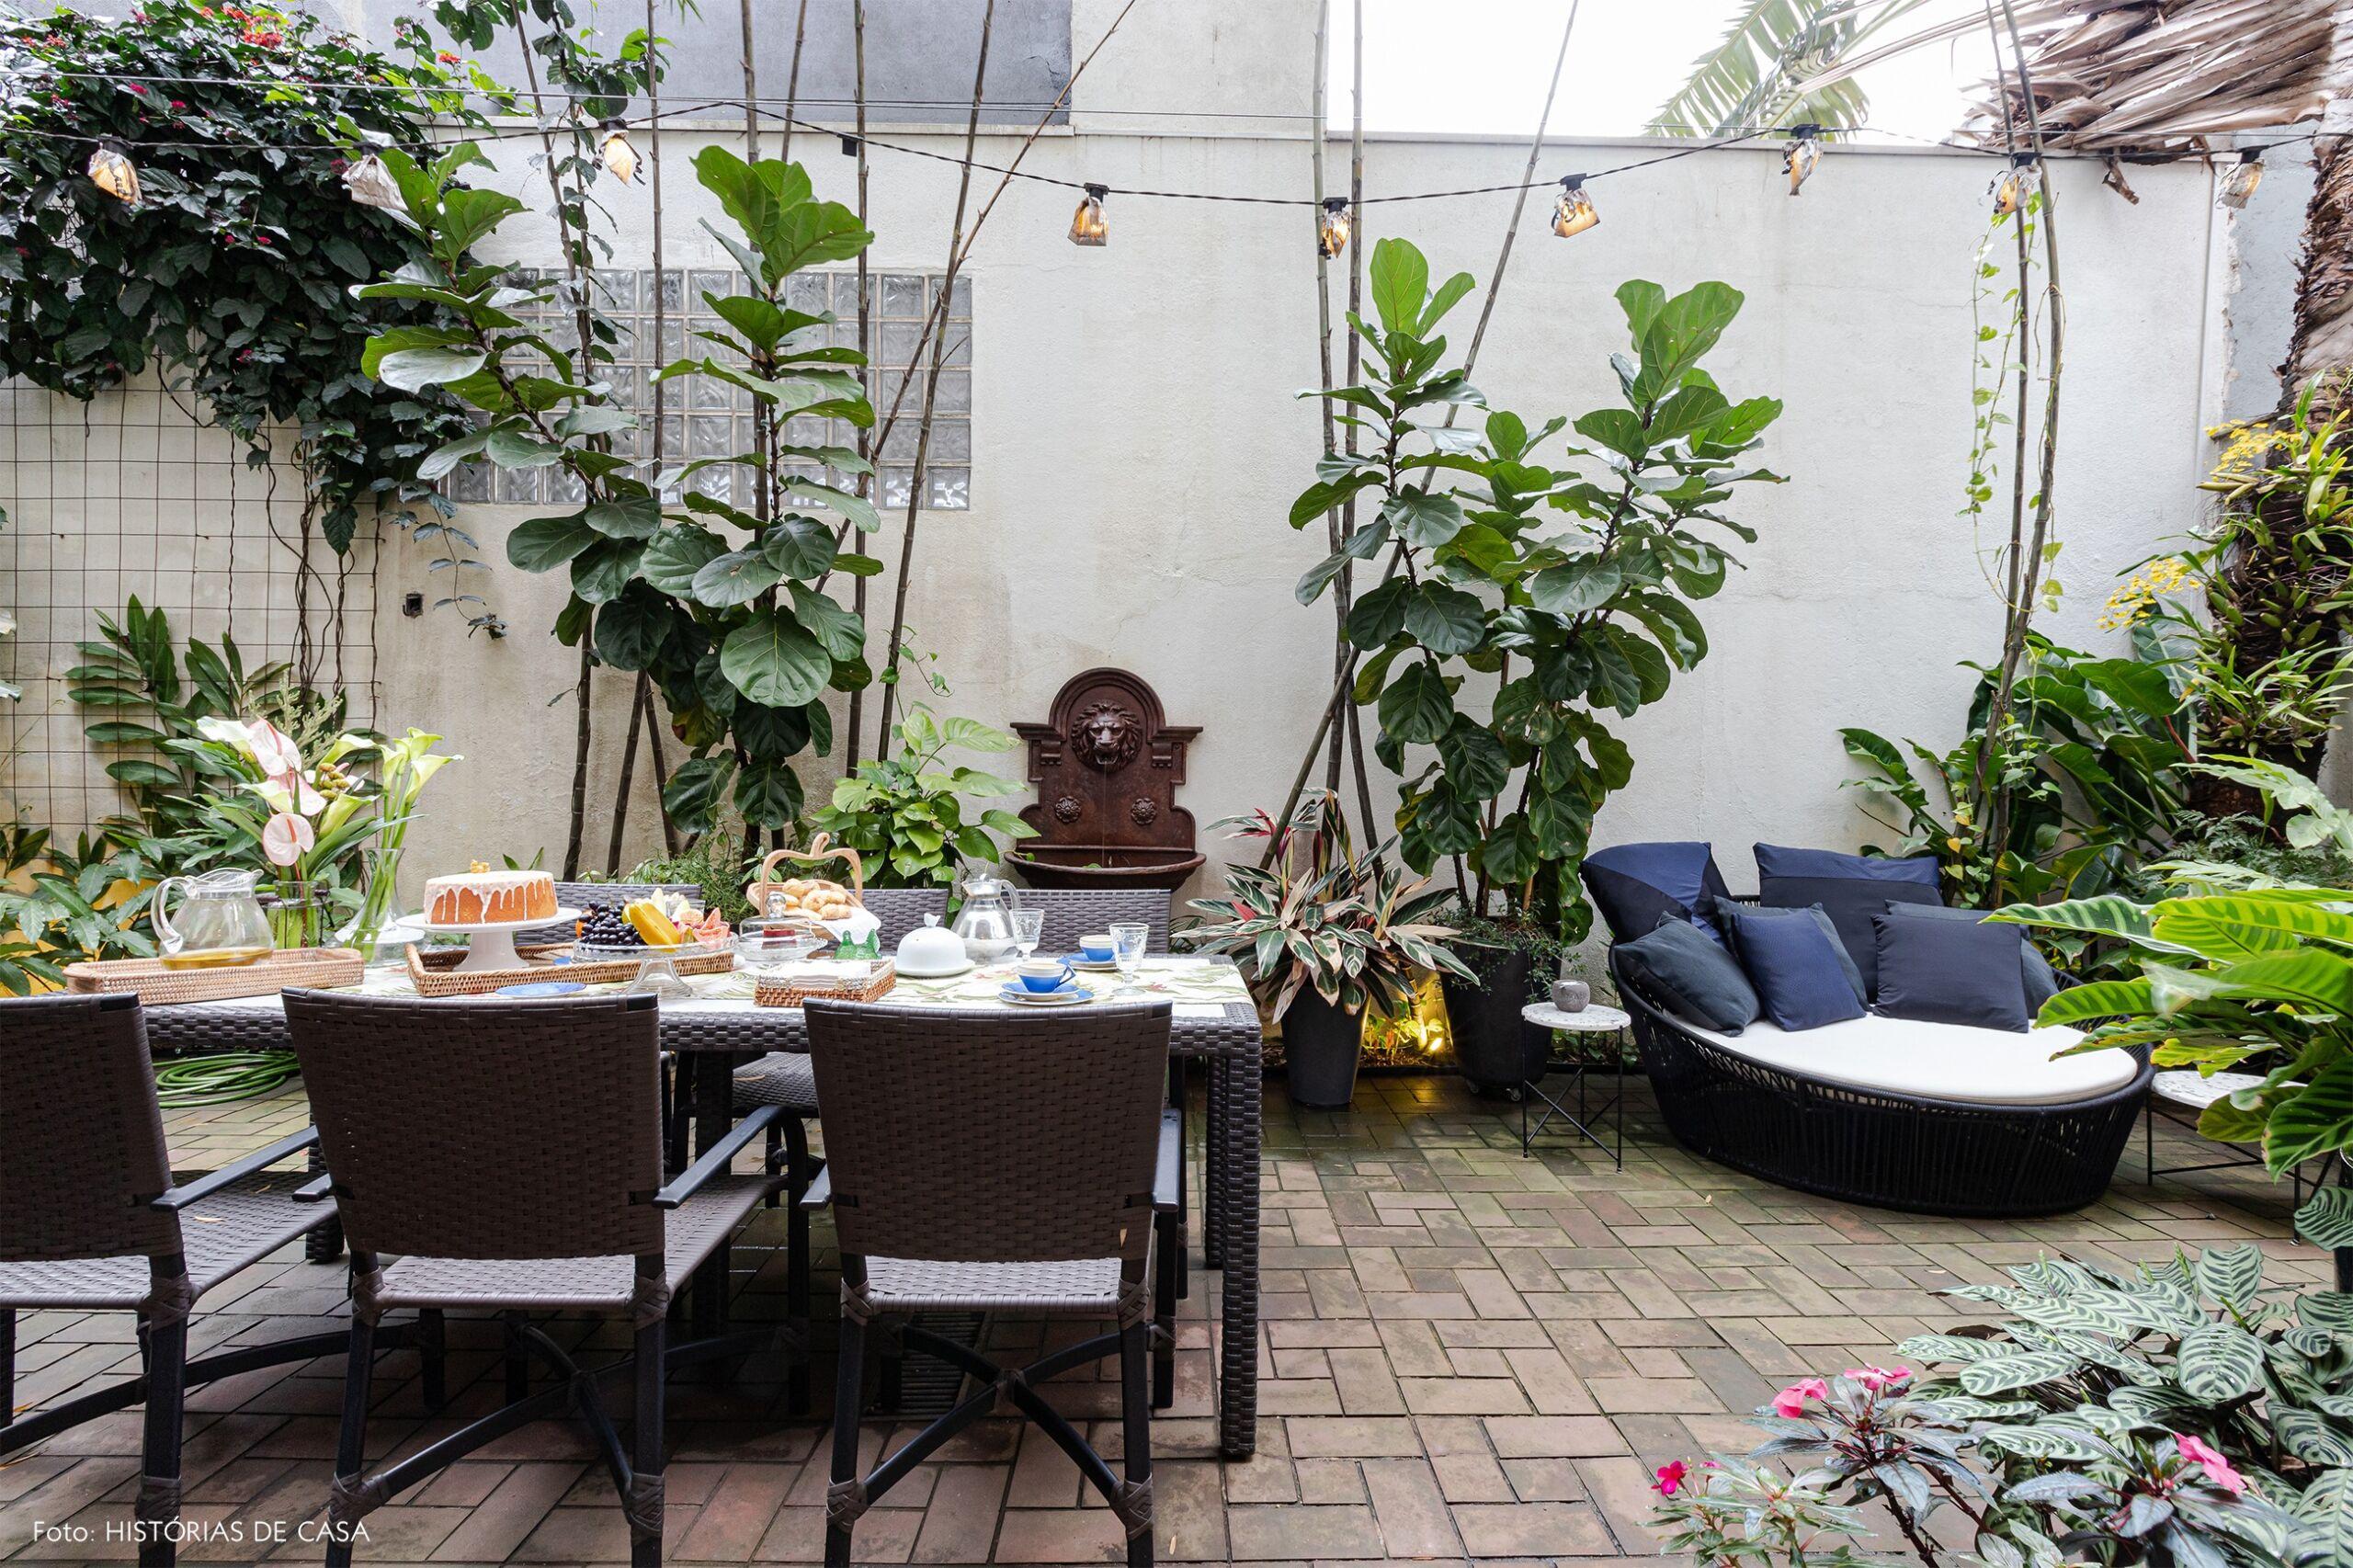 decoração jardim mesa jantar poltrona